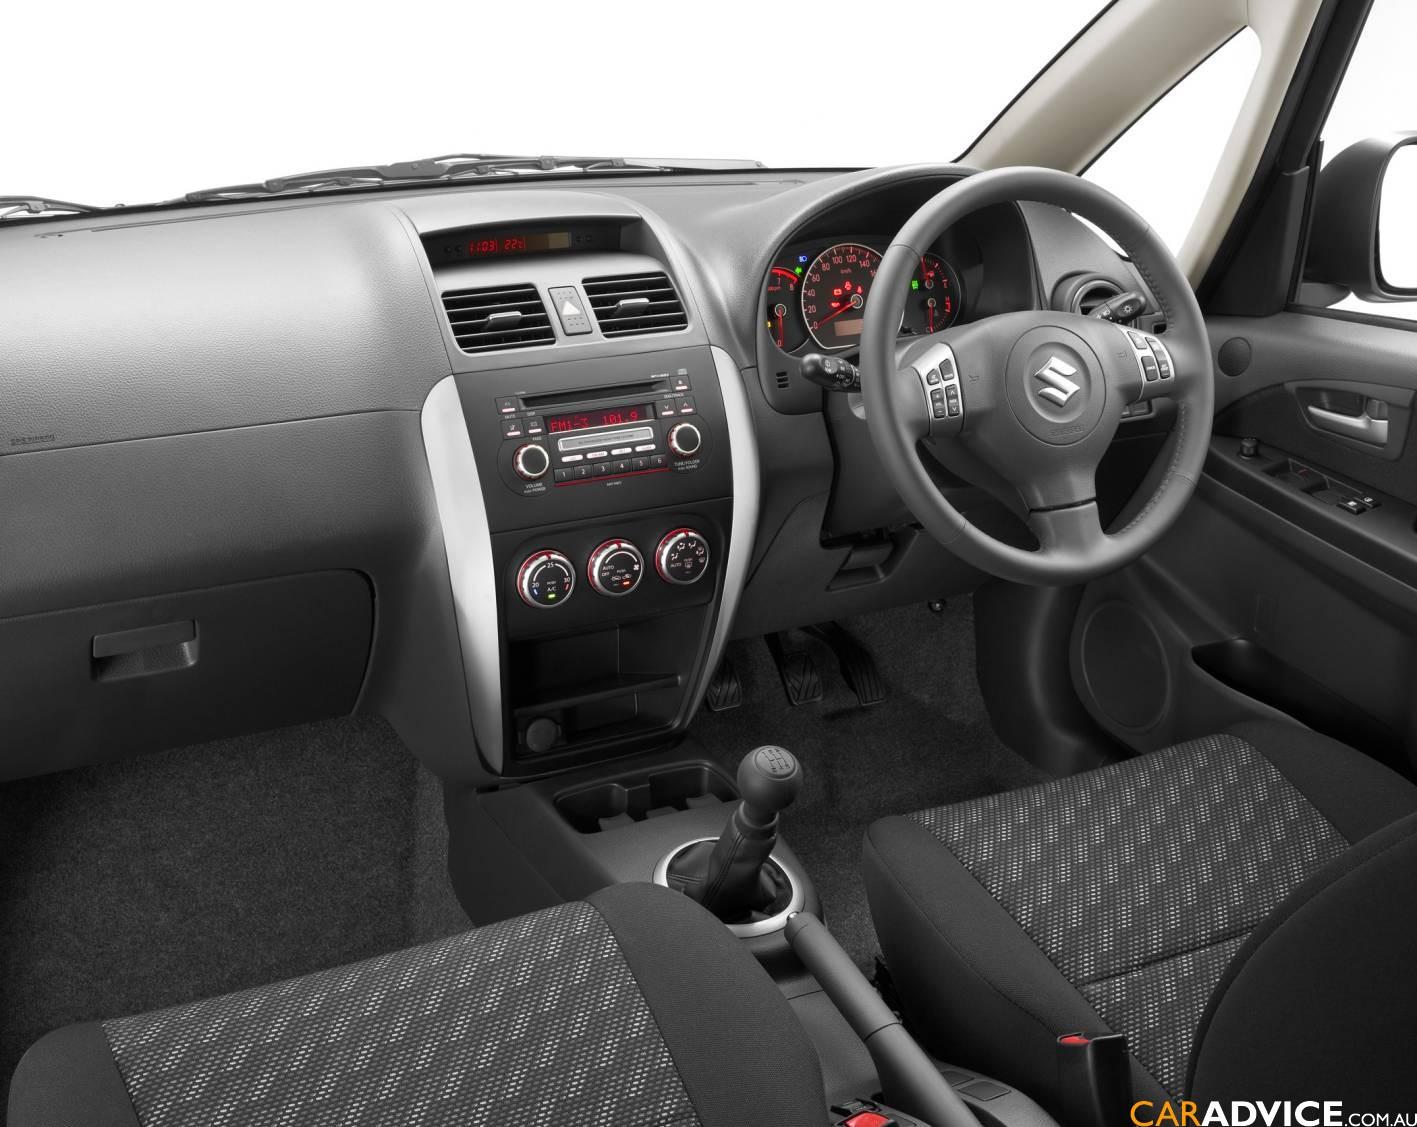 Santa Fe Ford >> 2008 Suzuki SX4 AWD Hatch - photos | CarAdvice